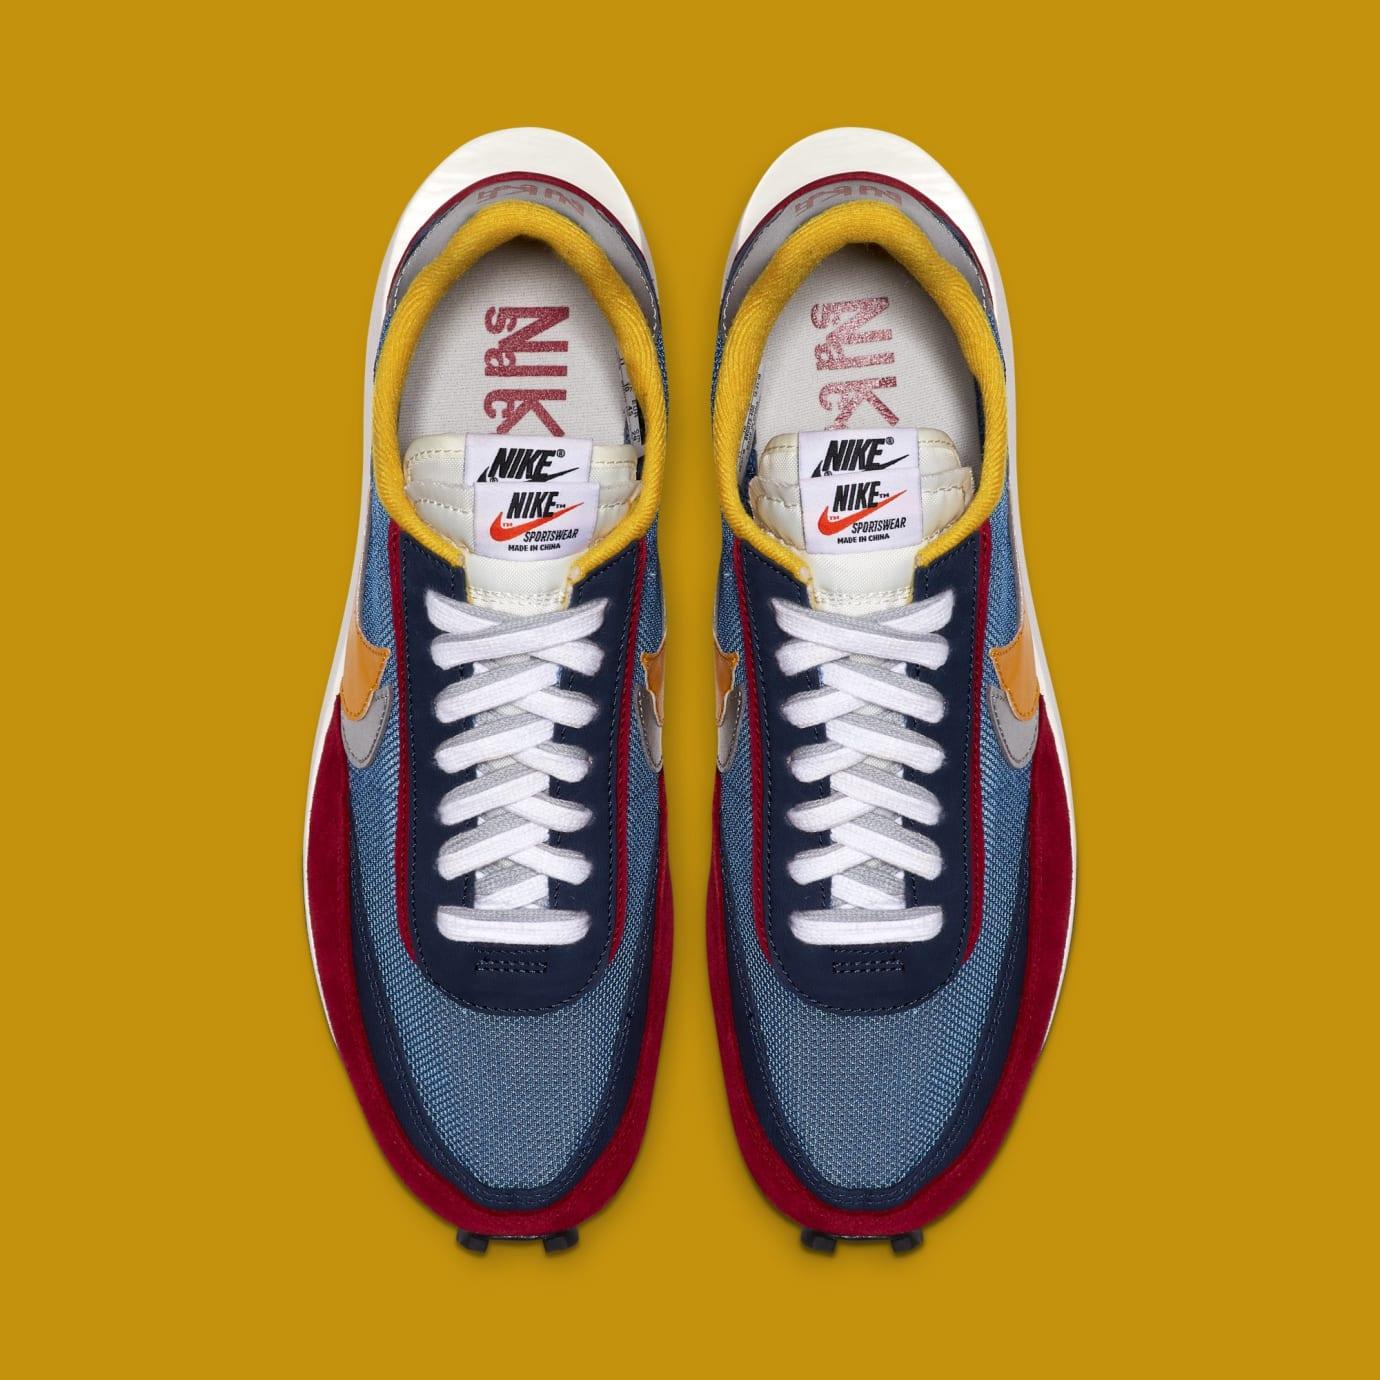 Sacai x Nike LDWaffle 'Varsity Blue/Del Sol/Varsity Red/Black' BV0073-400 (Top)